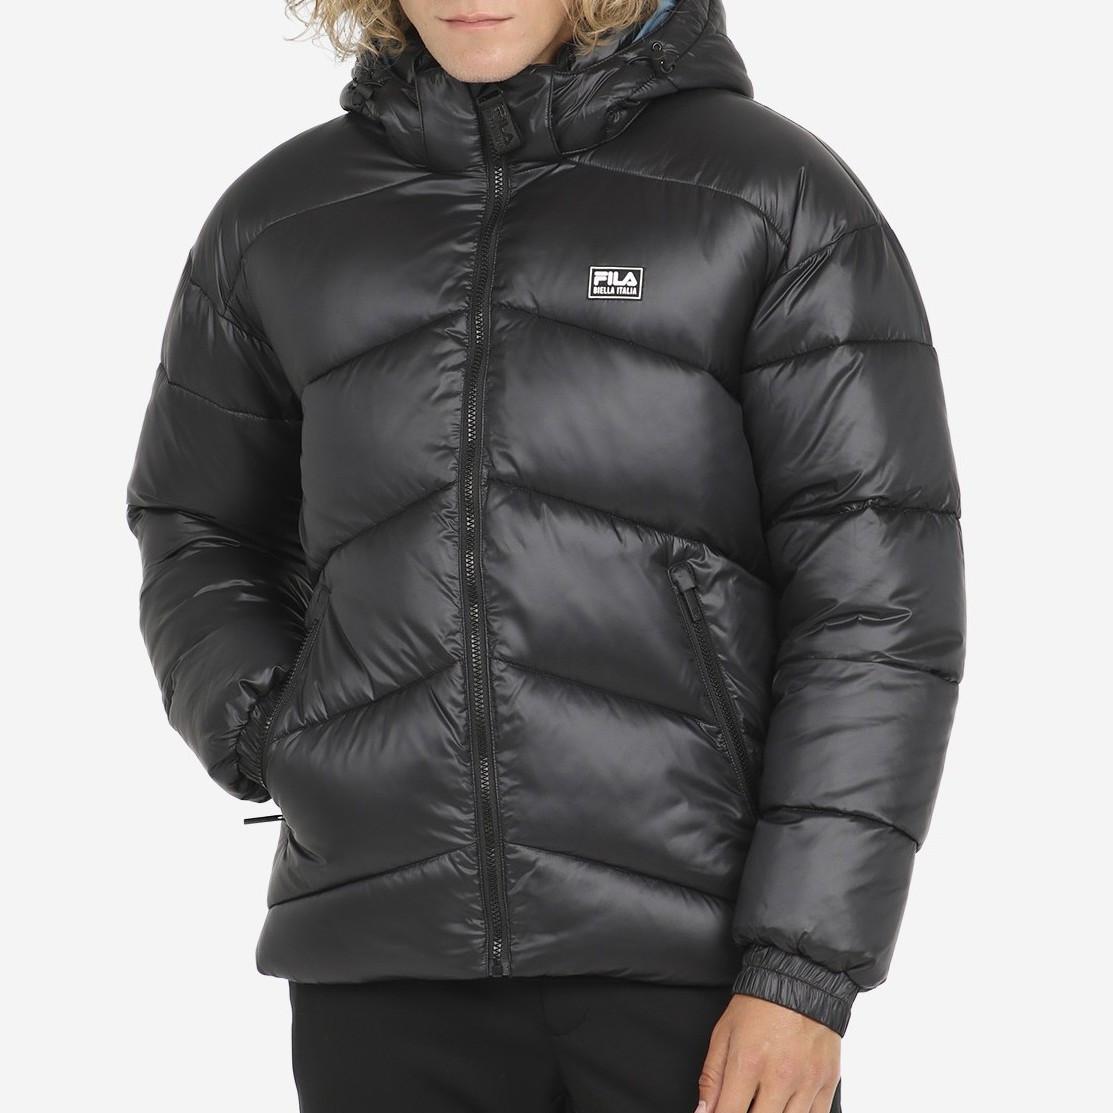 Утепленная мужская куртка Fila